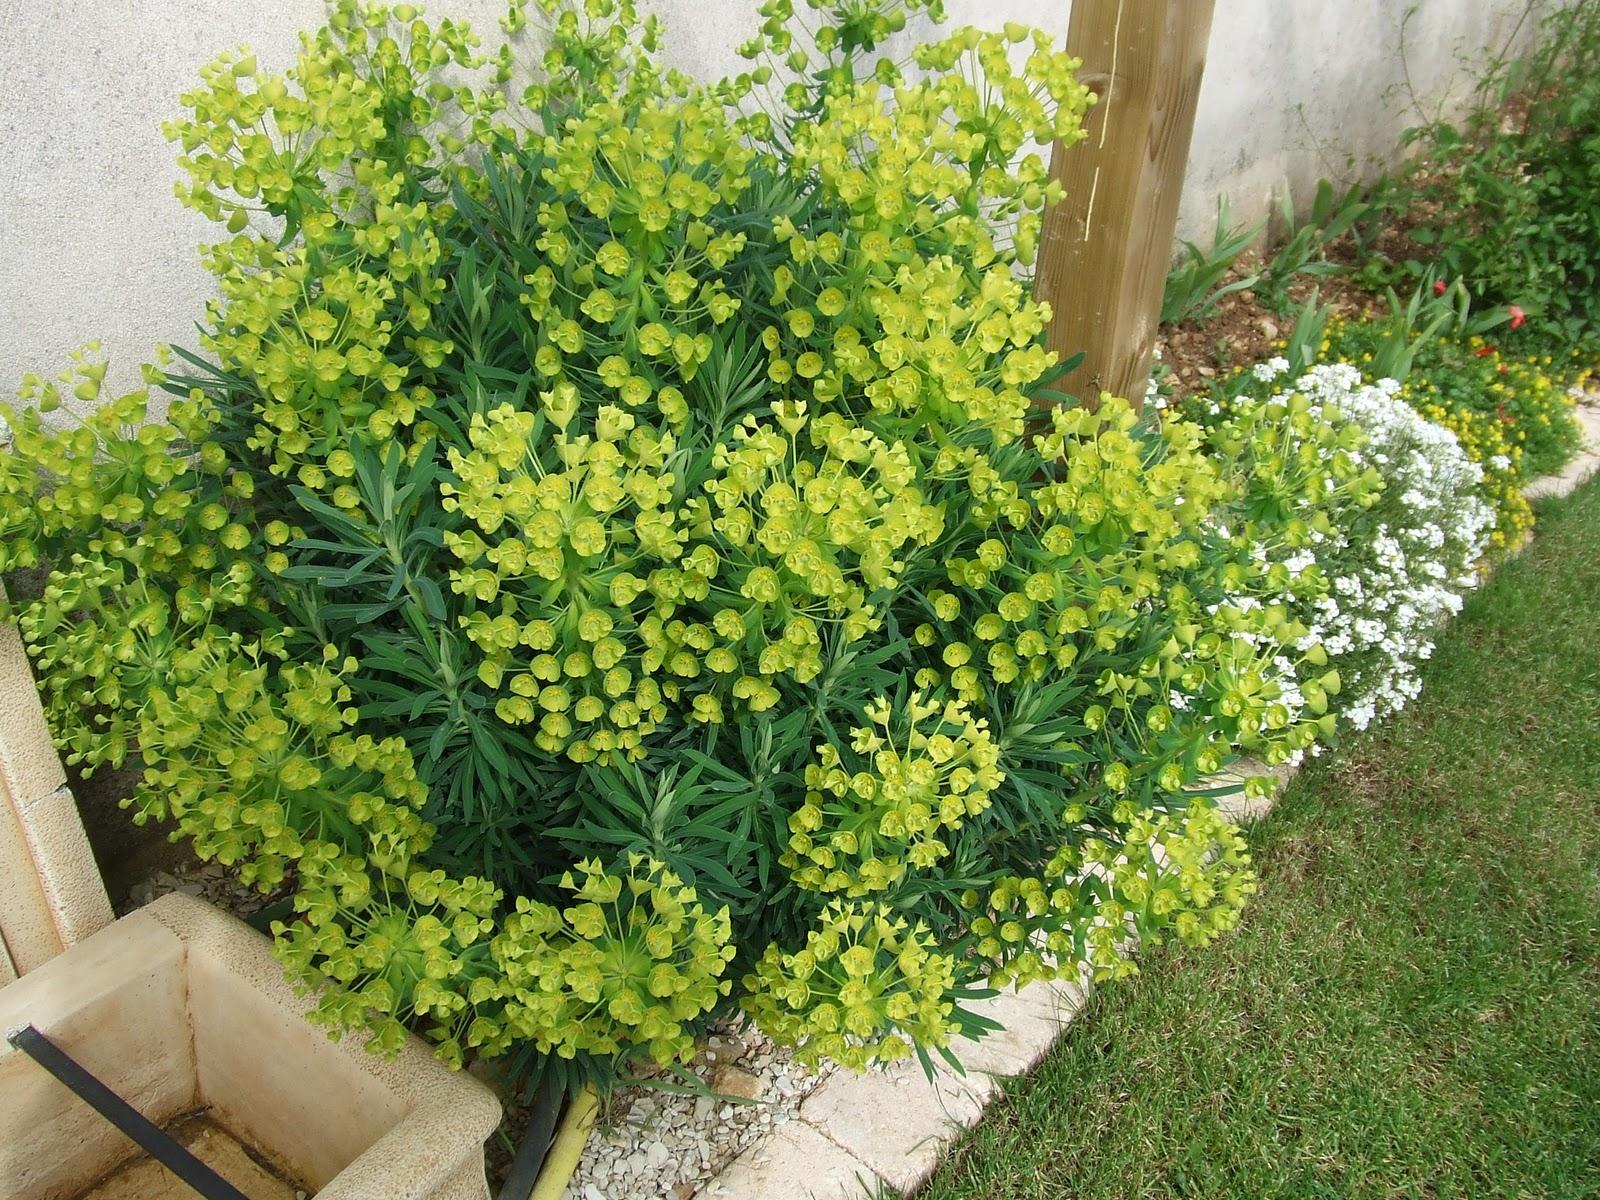 sanspareil euphorbia characias ssp wulfenii euphorbe characias riesenwolfsmilch palisaden. Black Bedroom Furniture Sets. Home Design Ideas